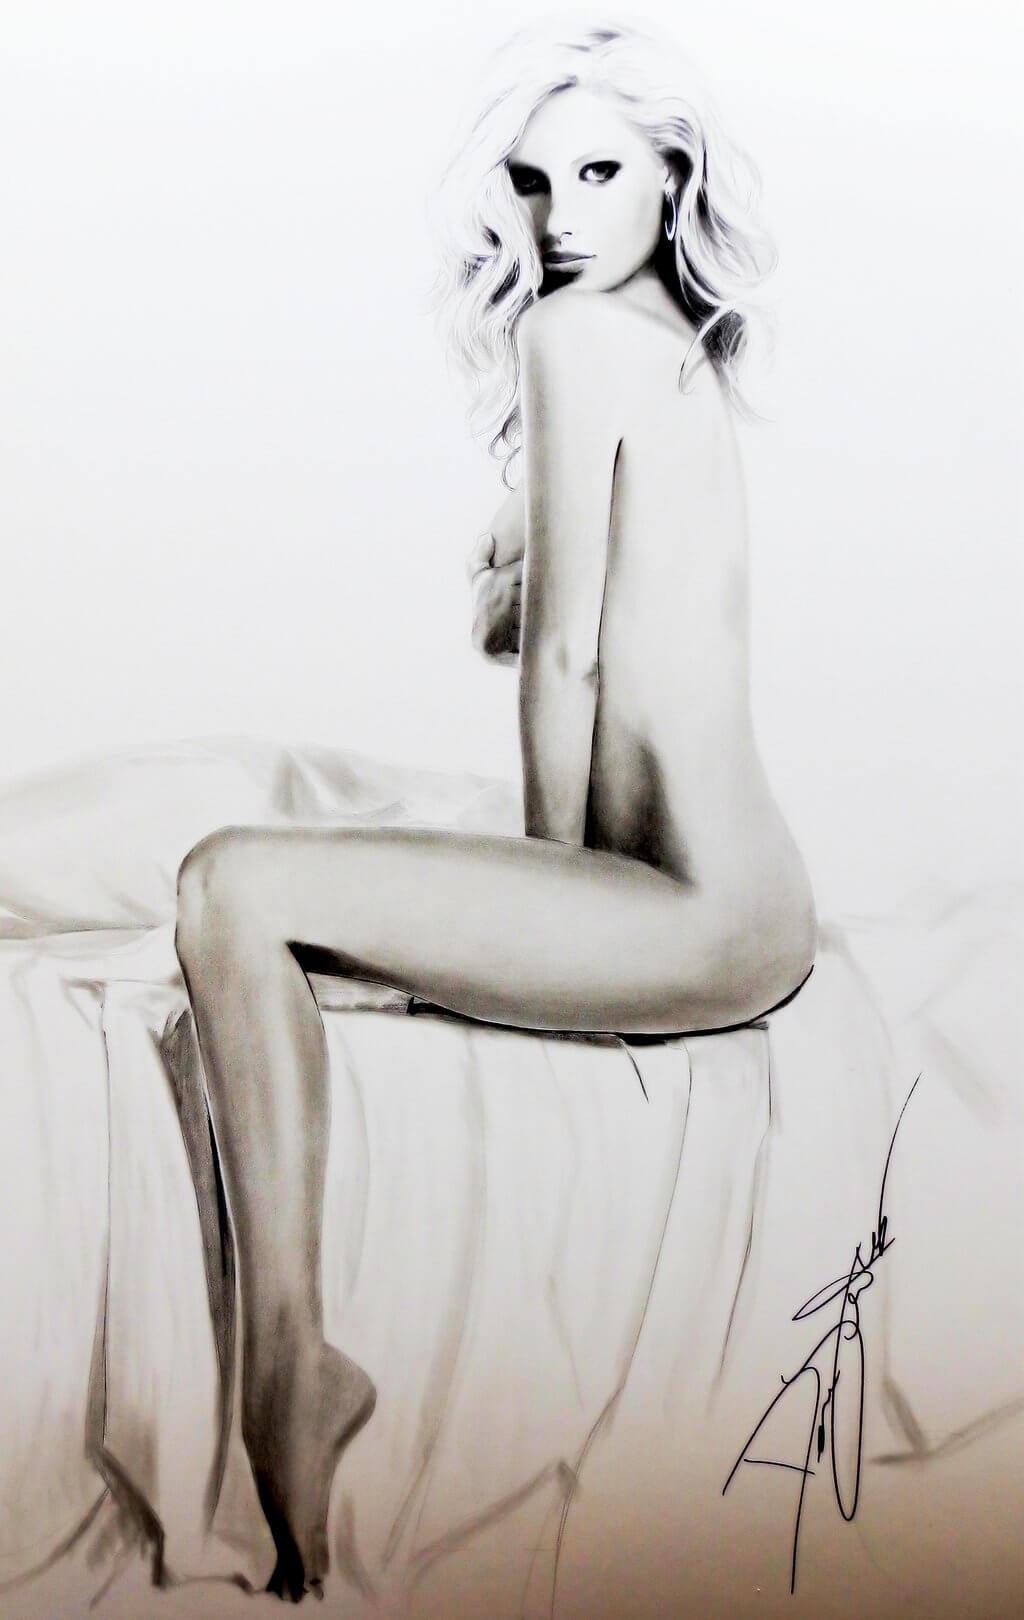 Inspirational Pencil Artwork entitled Jenn, by Artist Dave Lukas